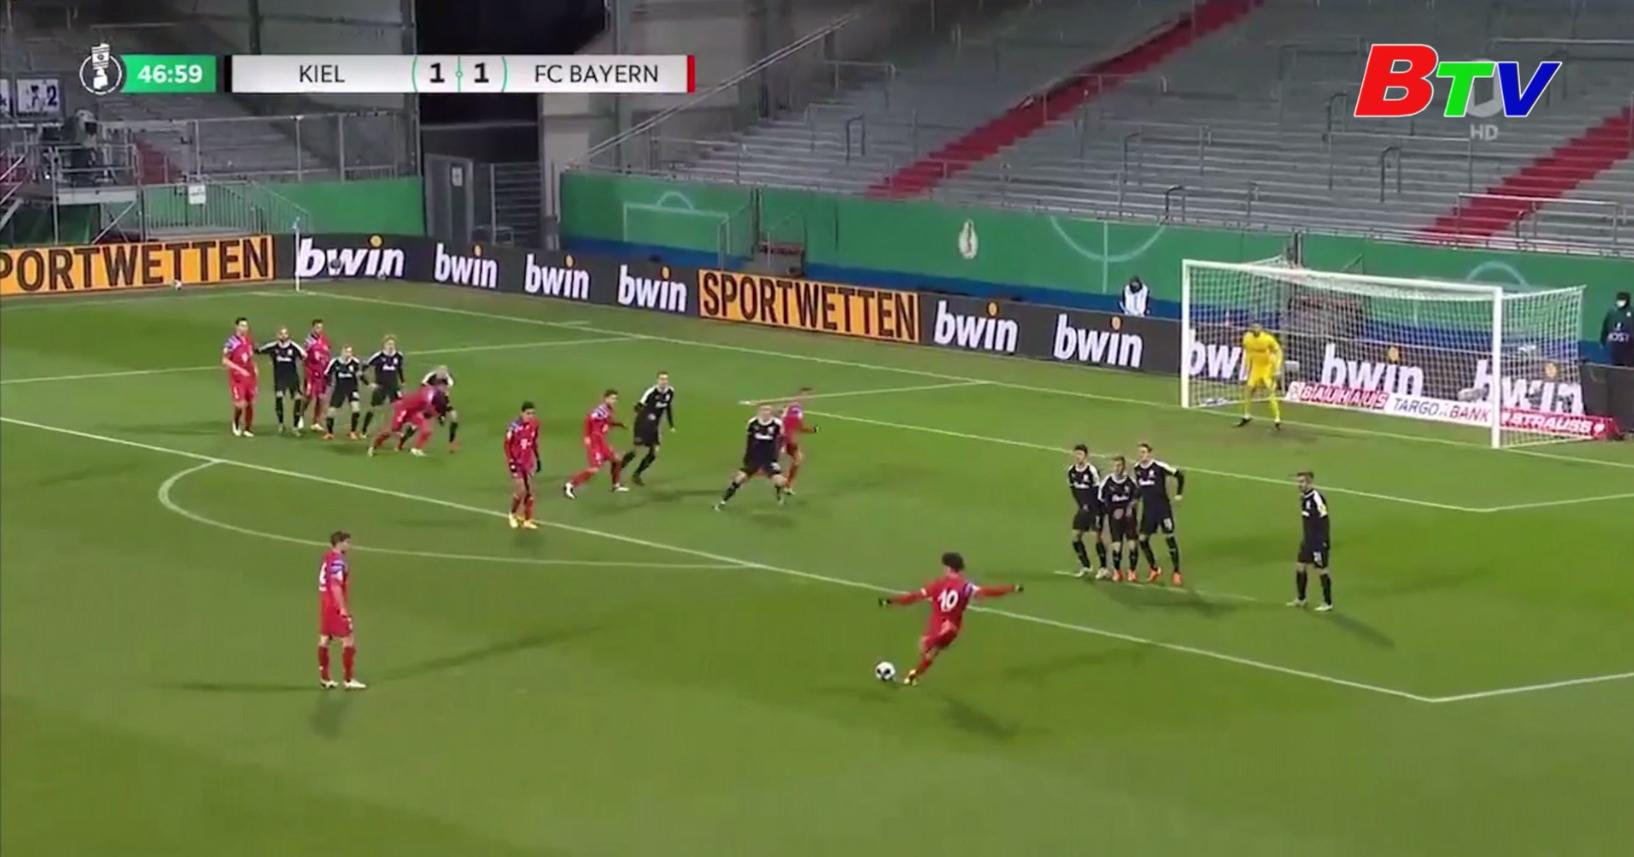 Bayern Munich bị loại khỏi Cúp Quốc gia Đức